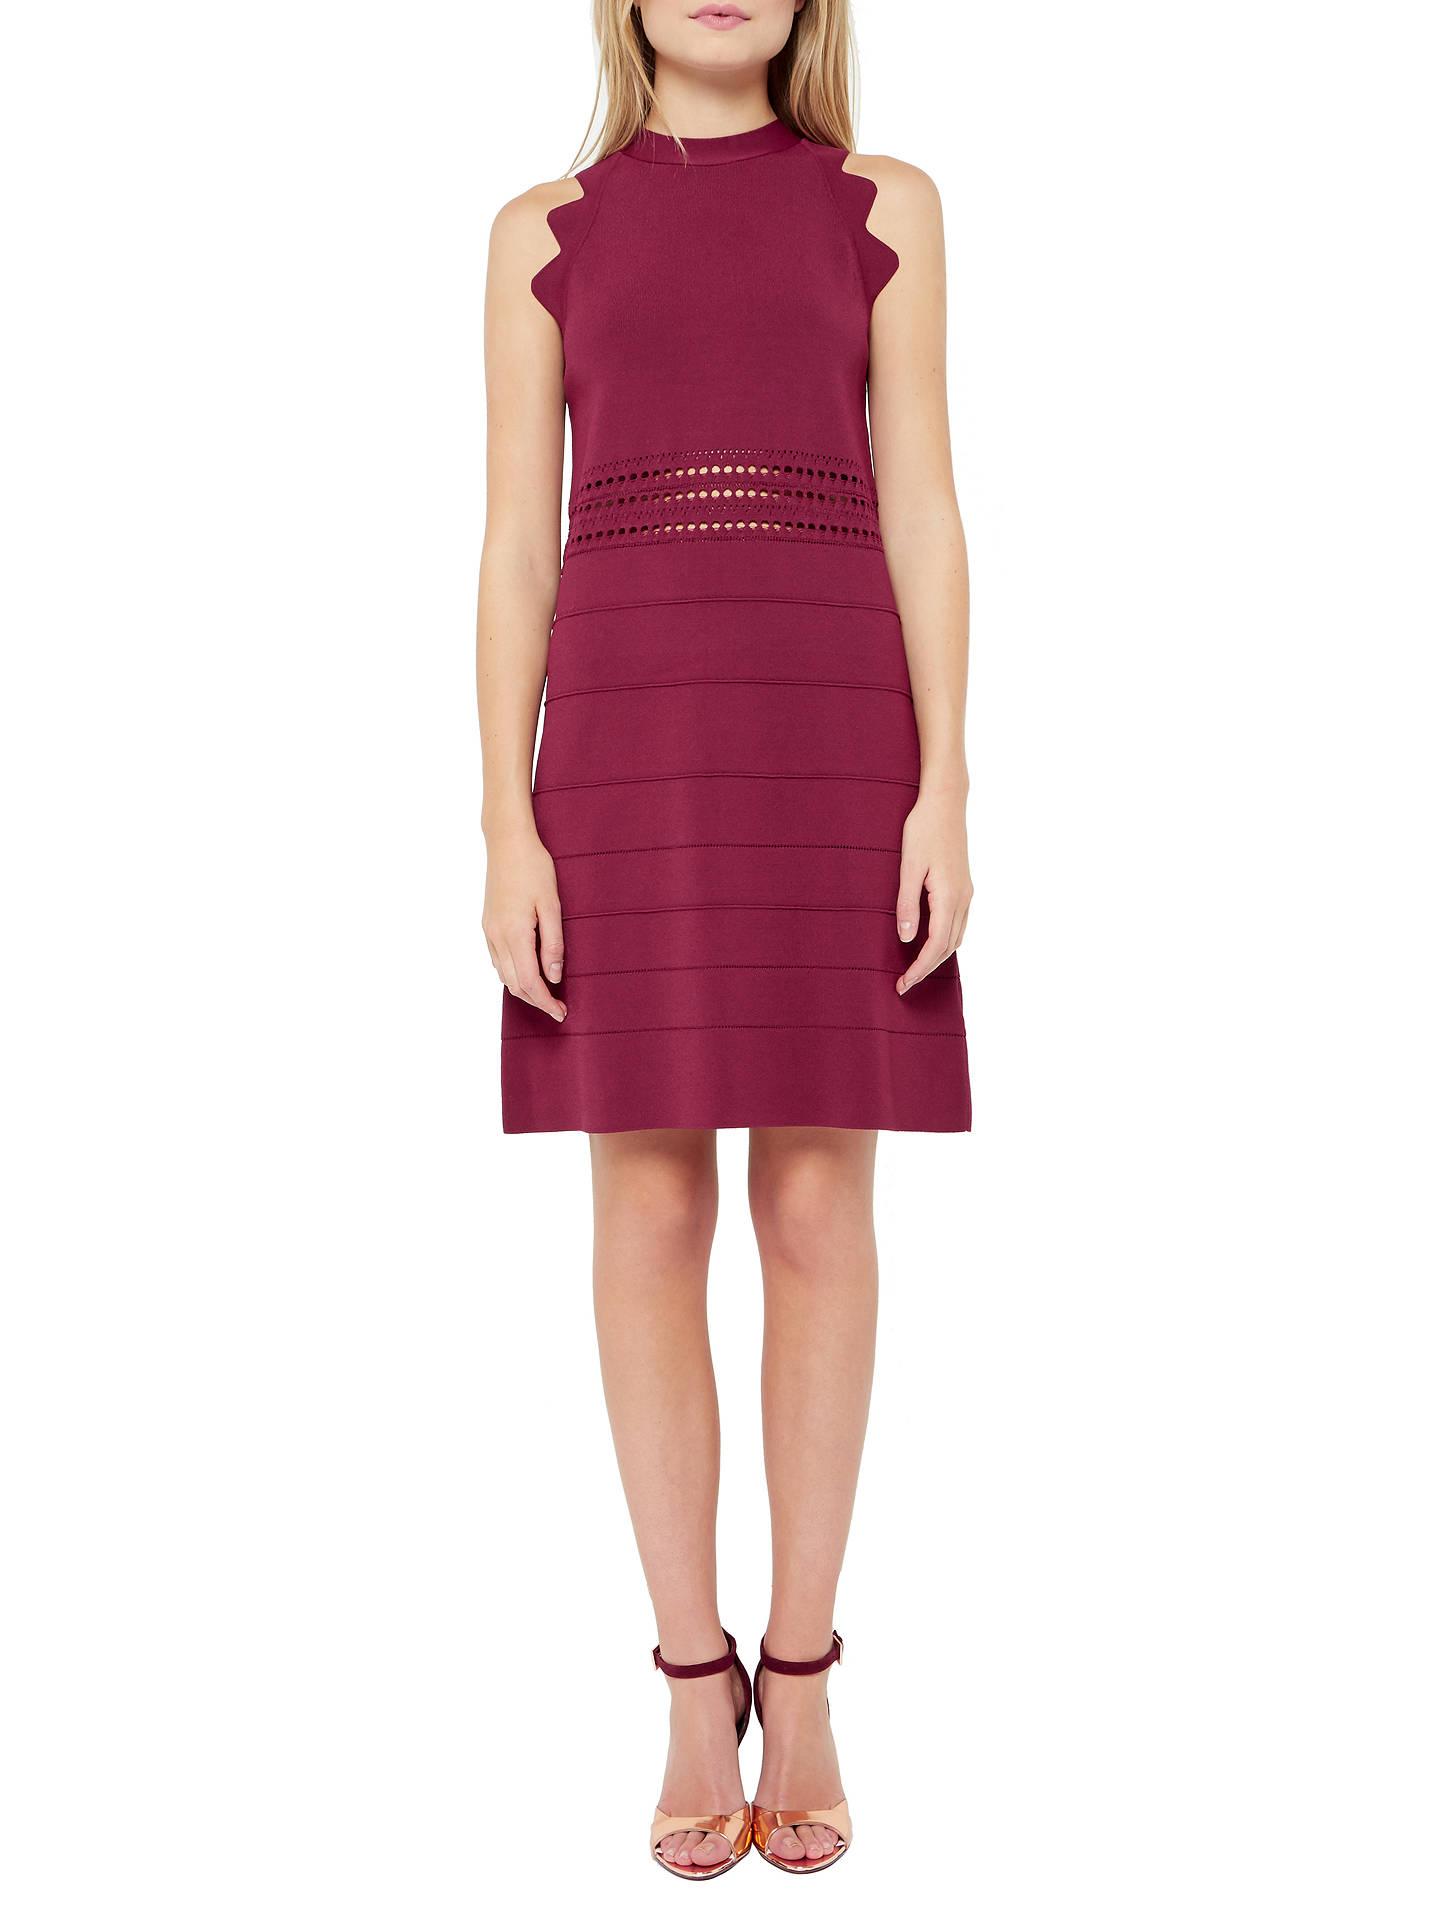 d700fb3f6 Buy Ted Baker Natleah Scallop Detail Ribbed Dress